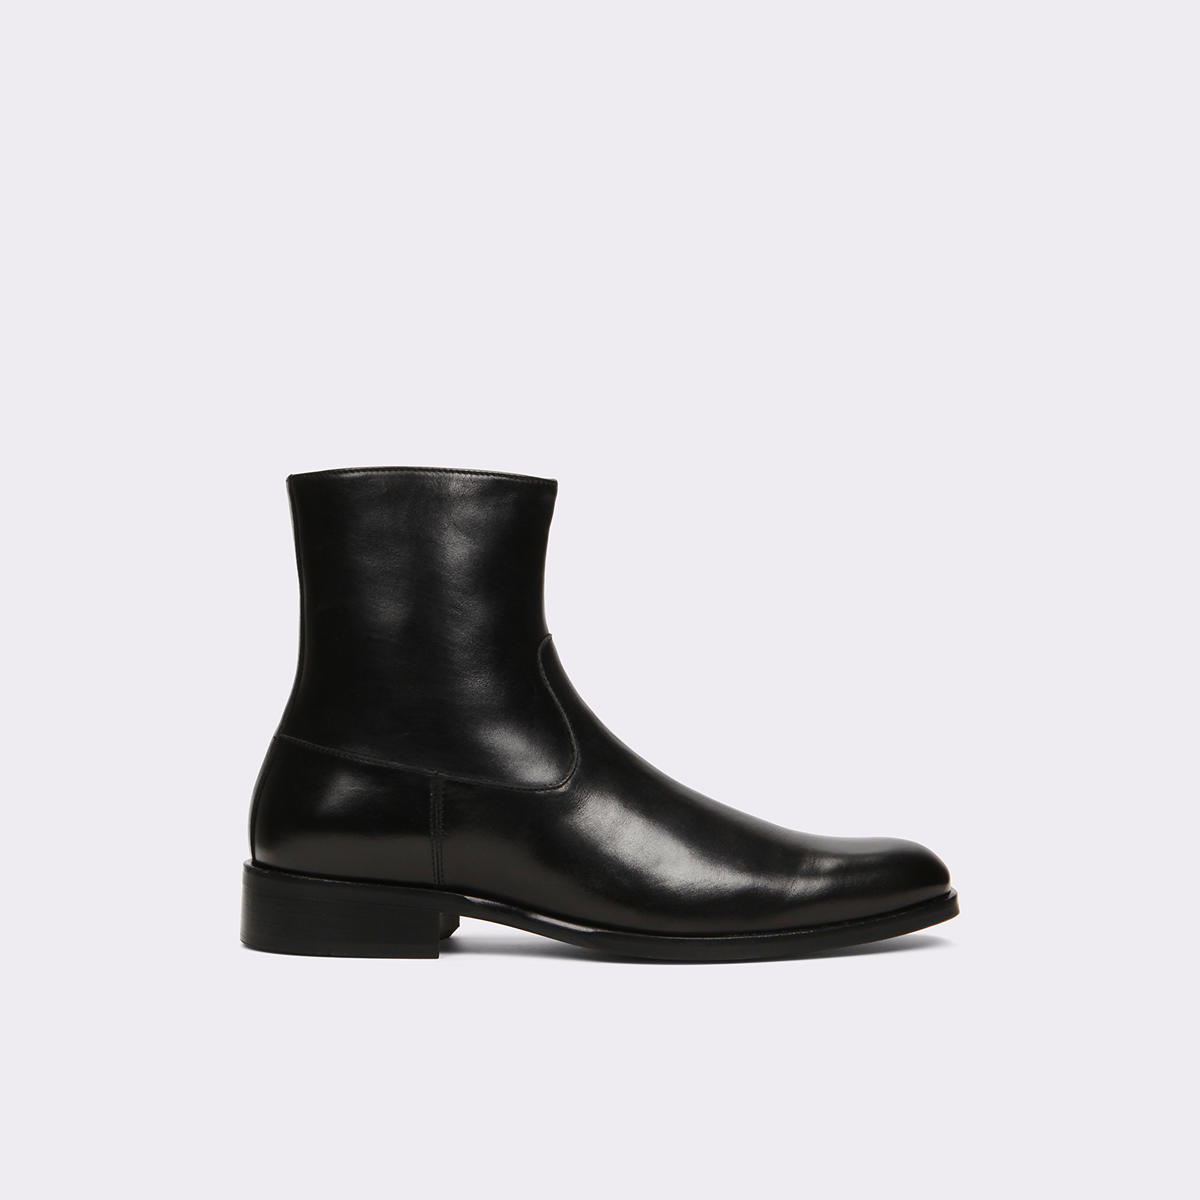 aldo shoes price adjustment clause